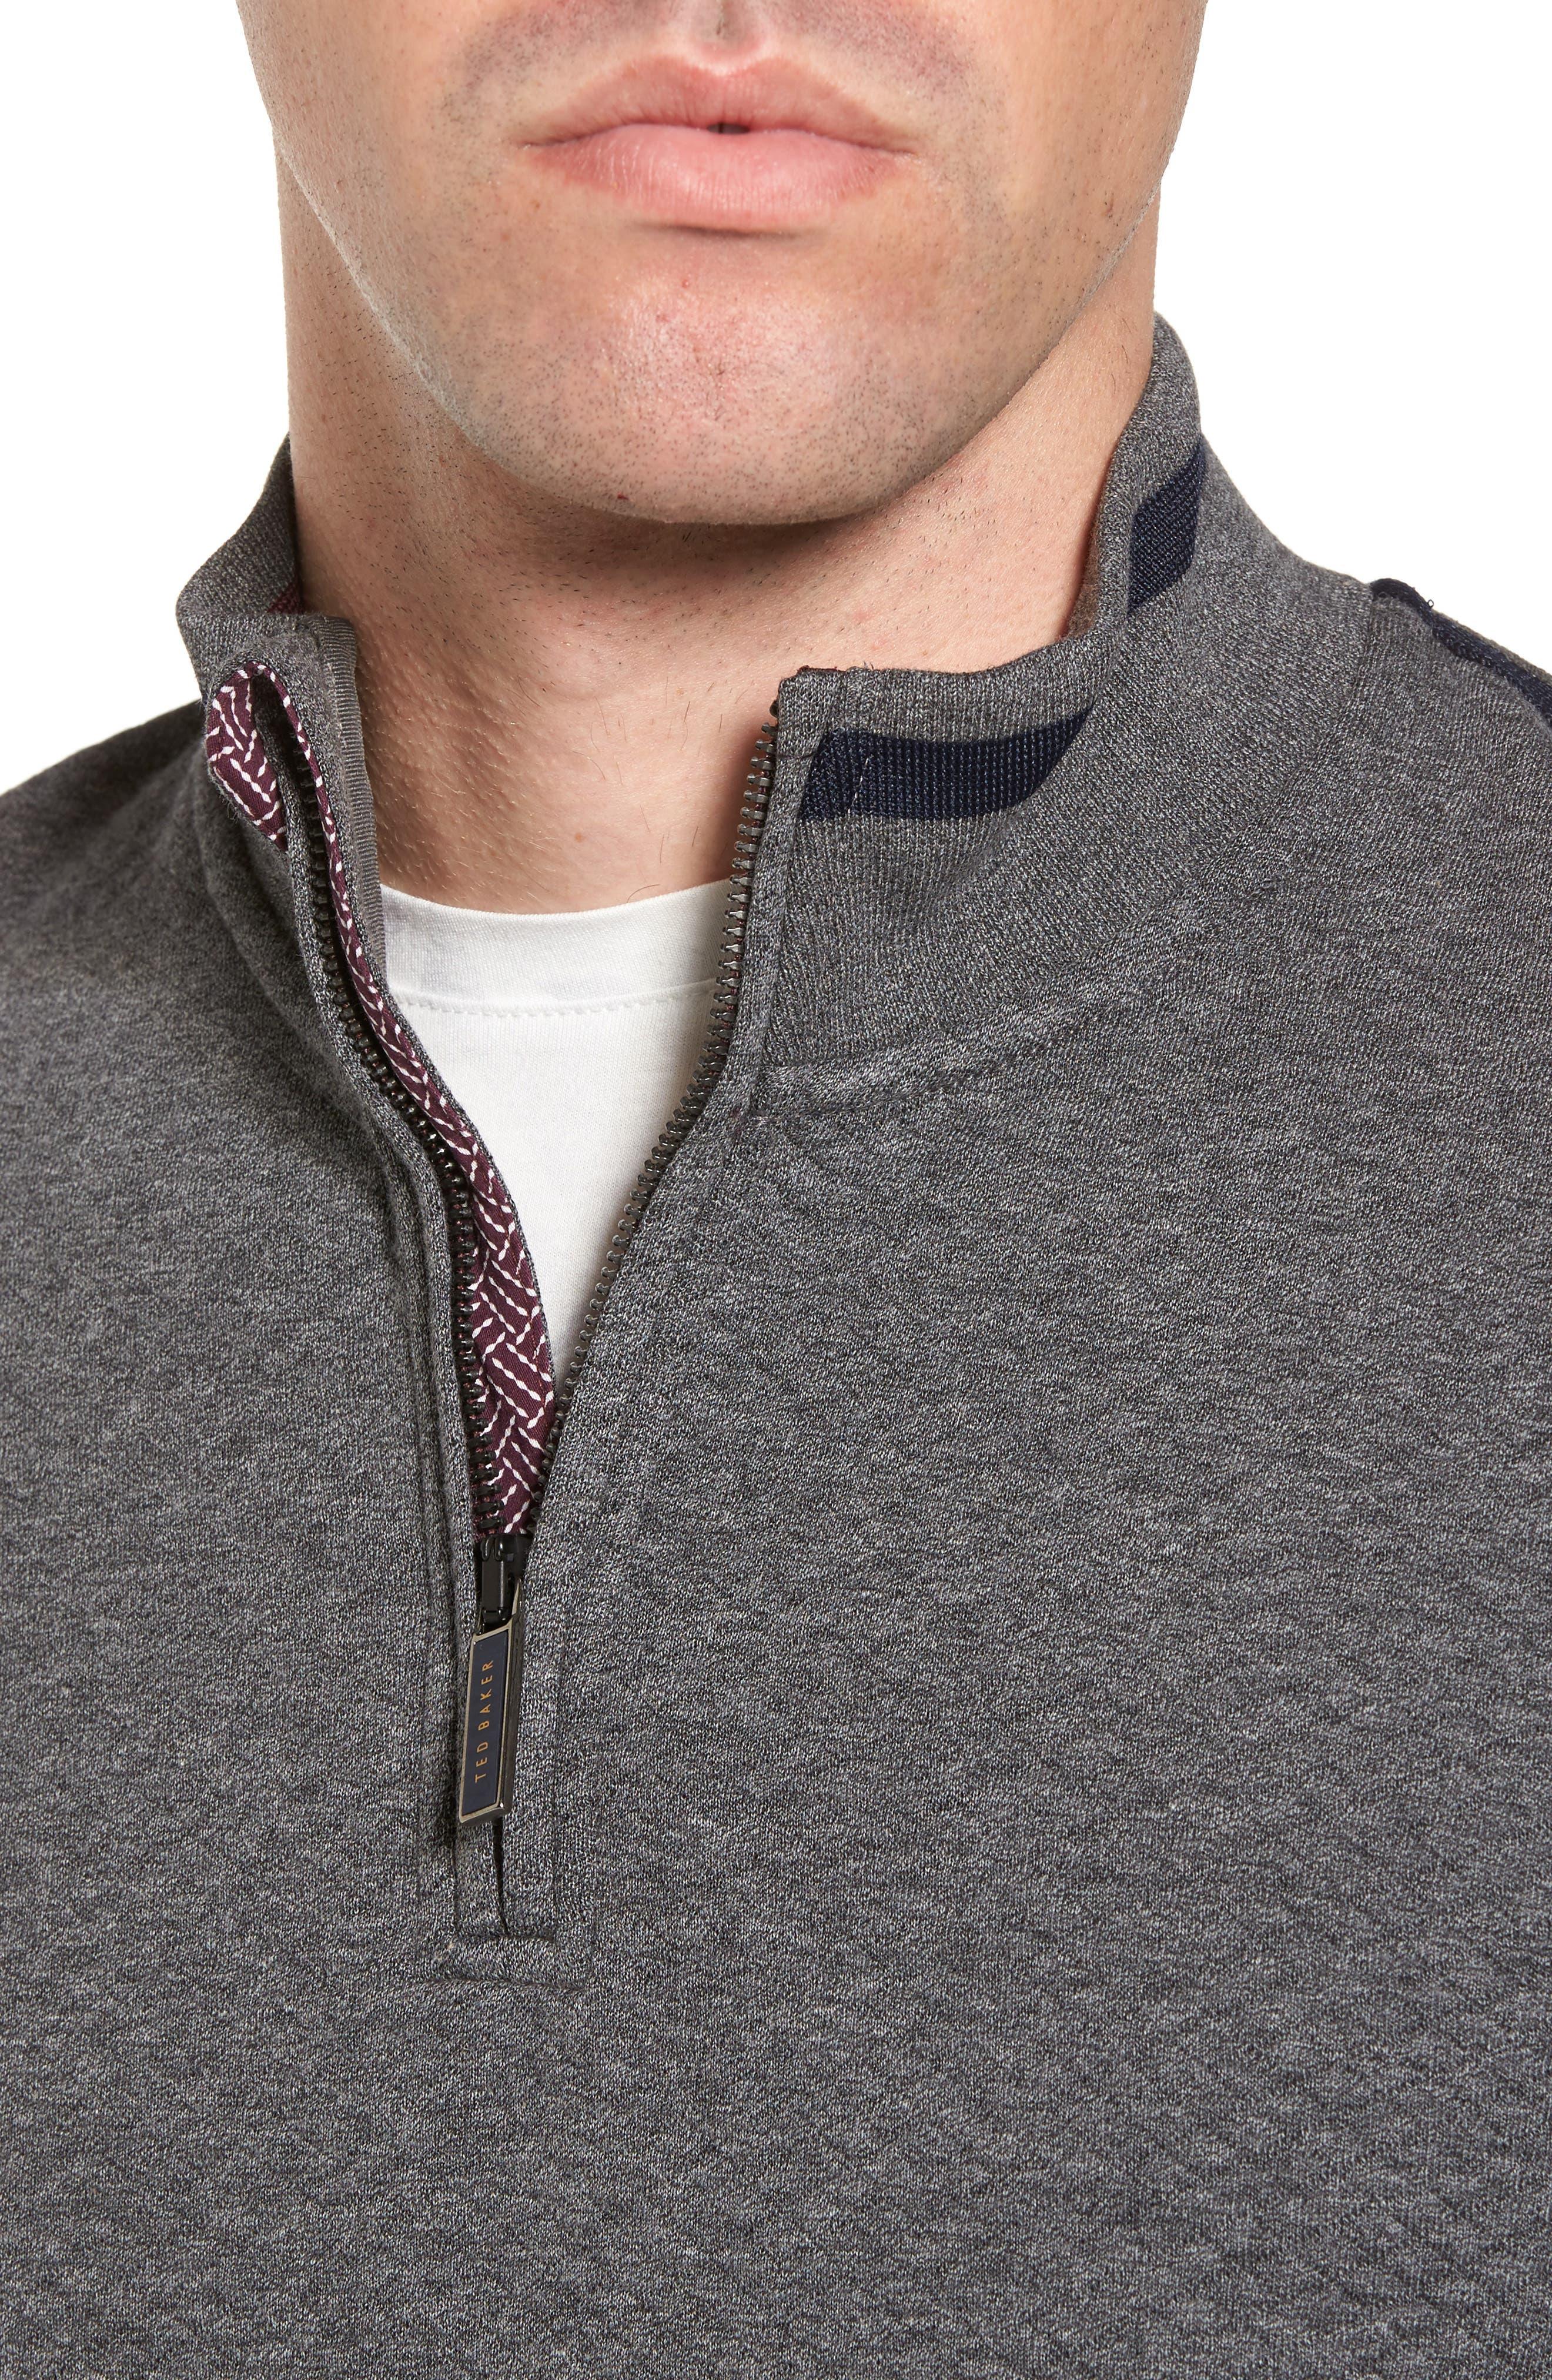 Sidney Quilted Quarter Zip Sweatshirt,                             Alternate thumbnail 4, color,                             Charcaol